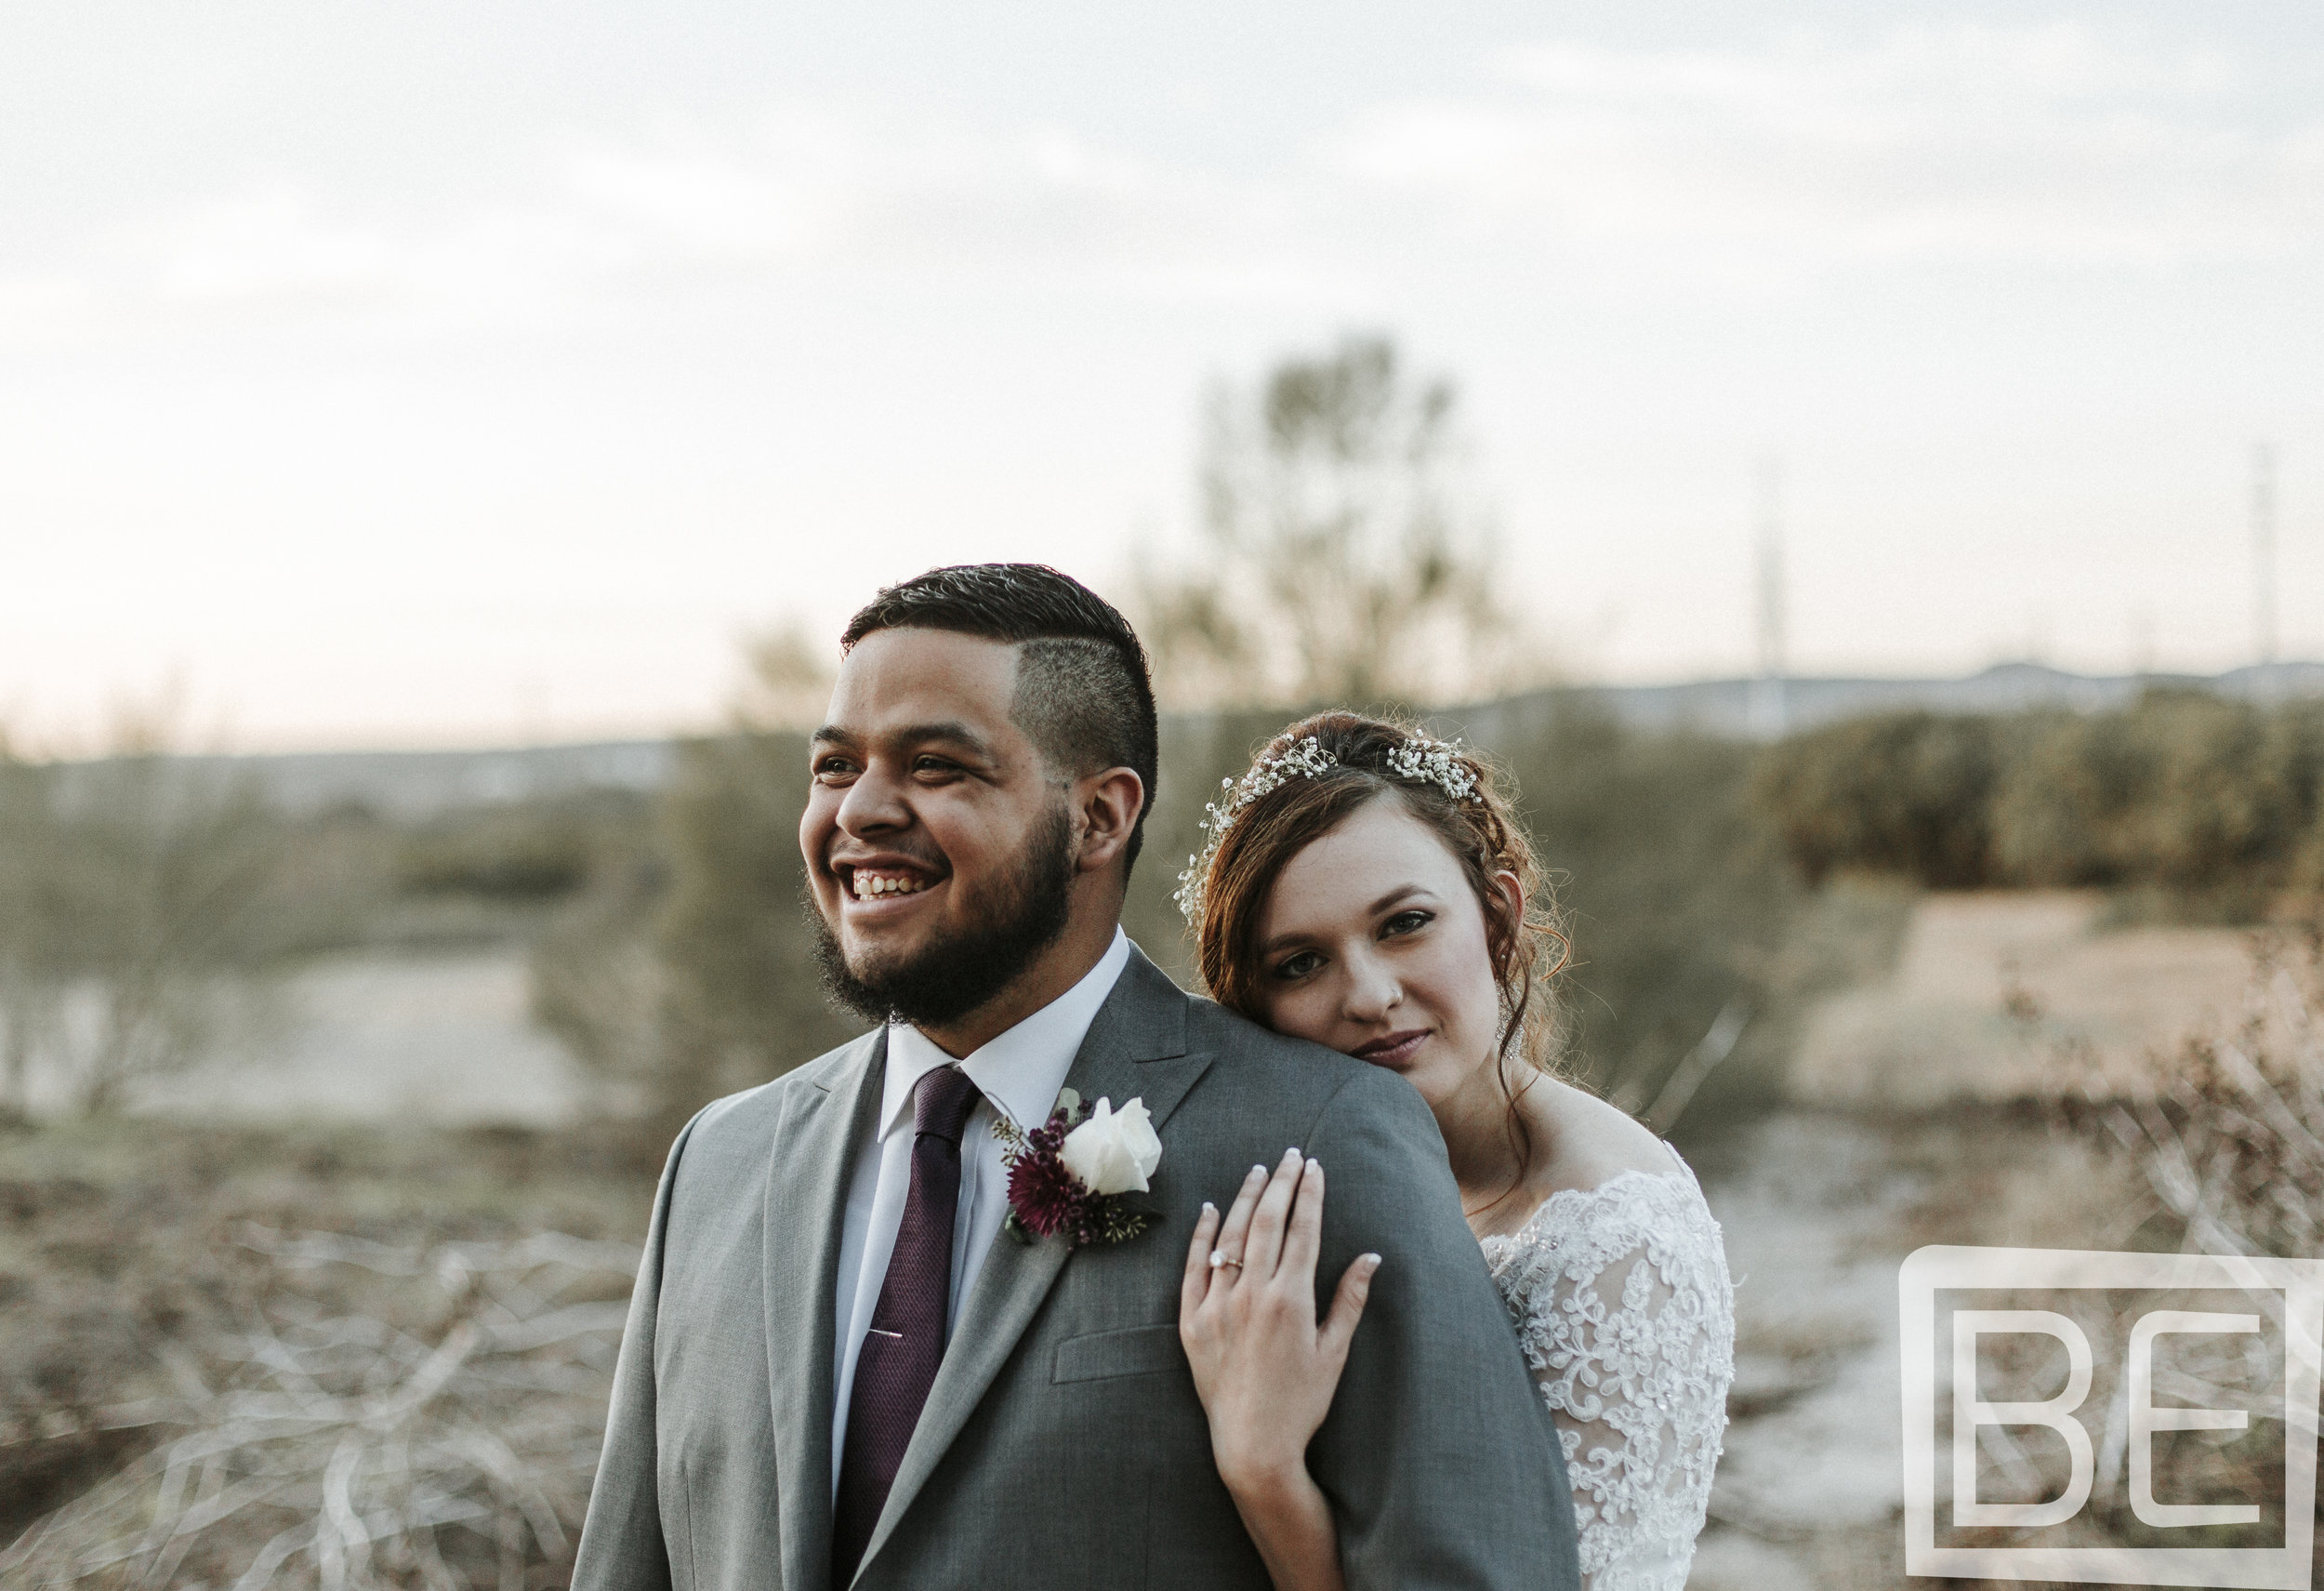 San Antonio Wedding - Soriano Wedding - Tanner Beason Photography-29.jpg